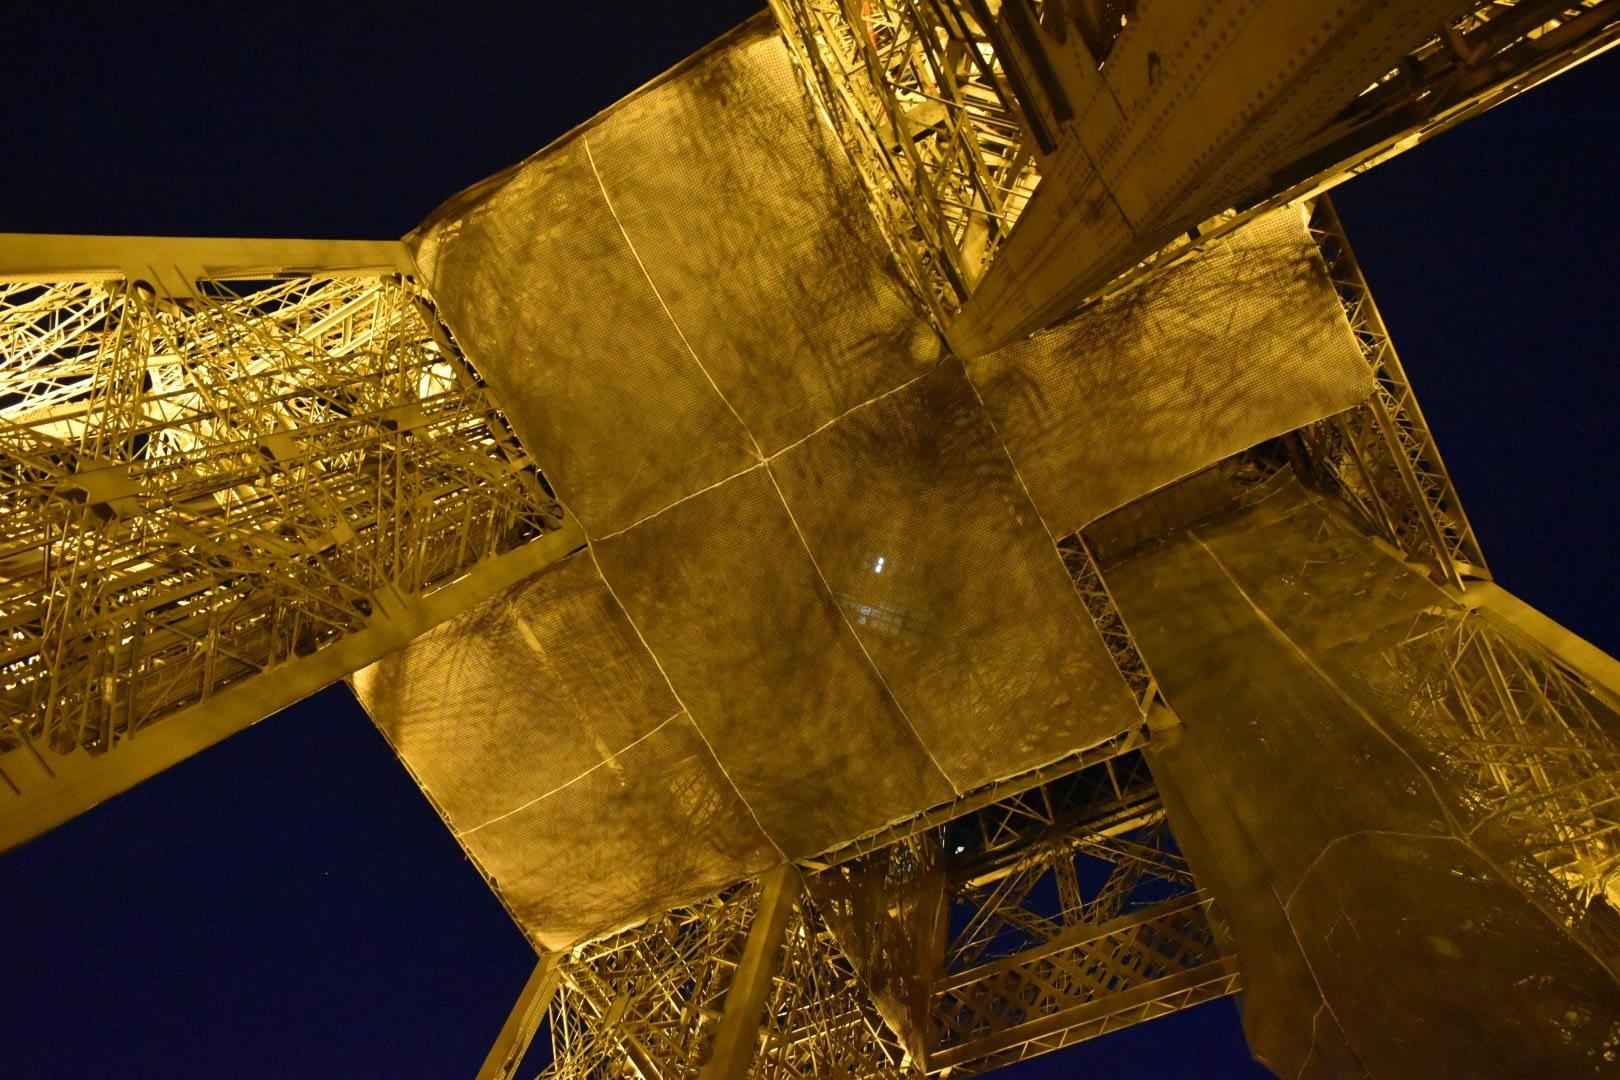 Bottom of the Eiffel Tower, Paris